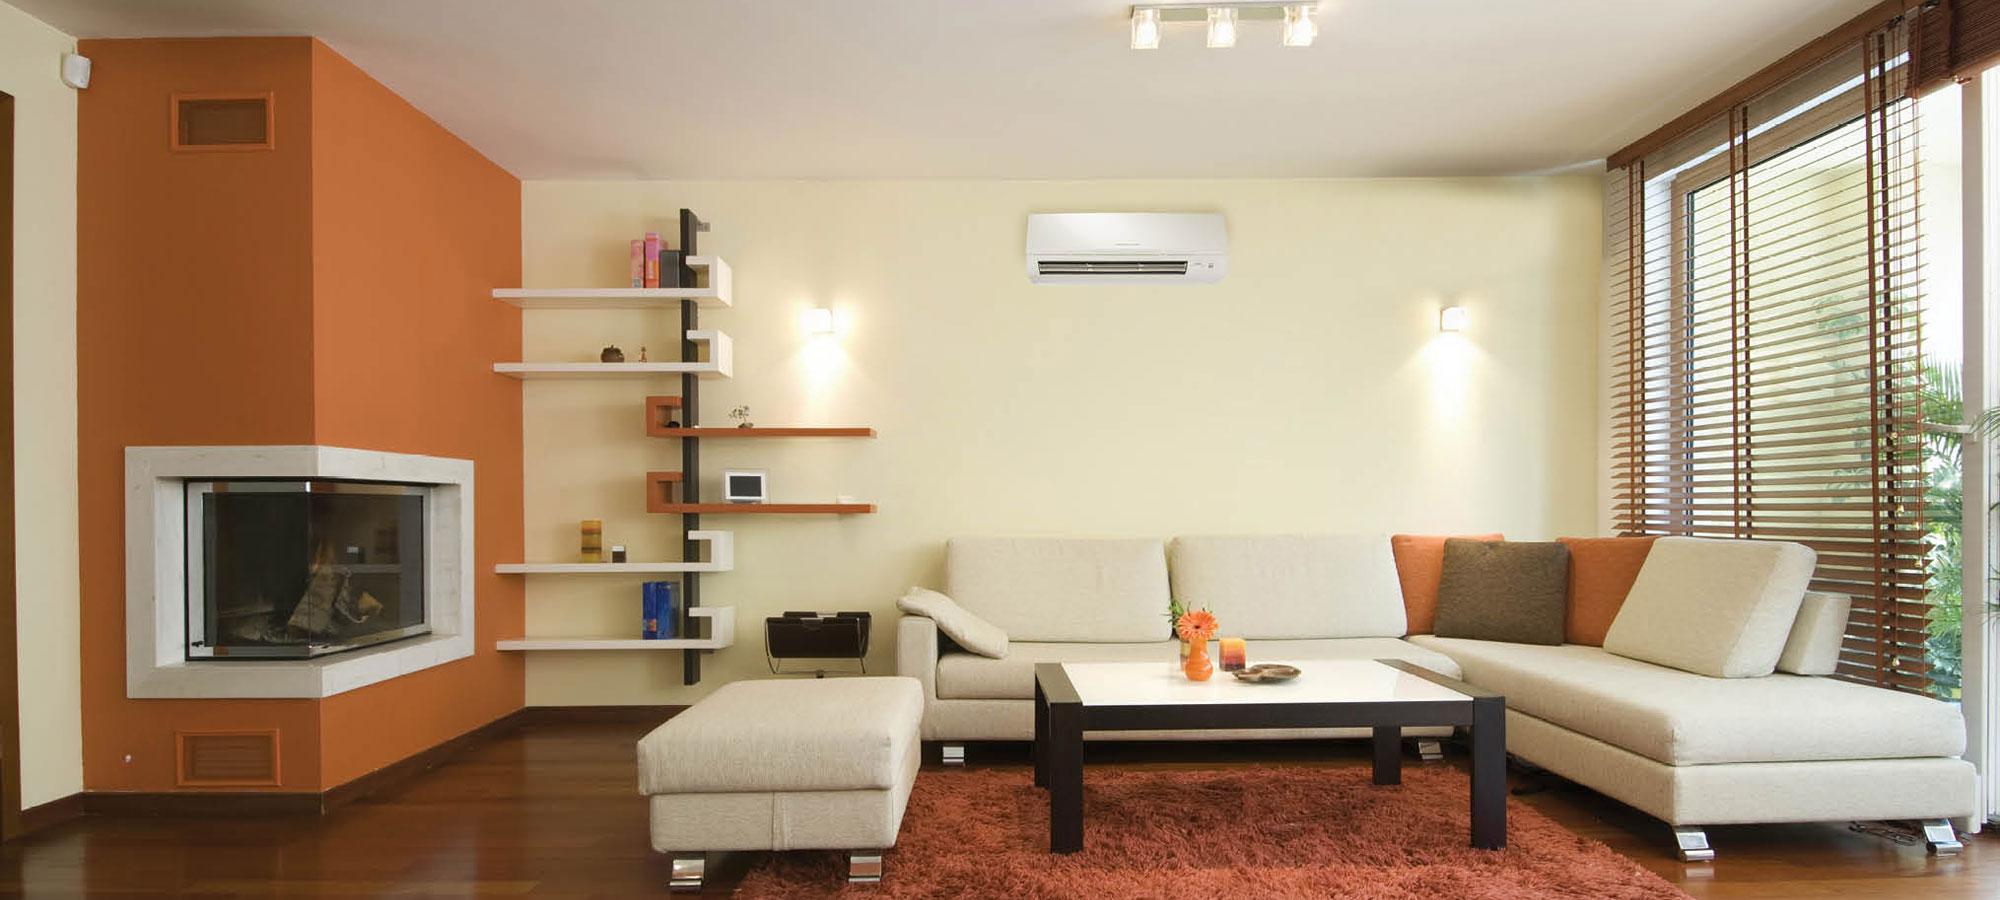 Ductless_Living_Room.jpg